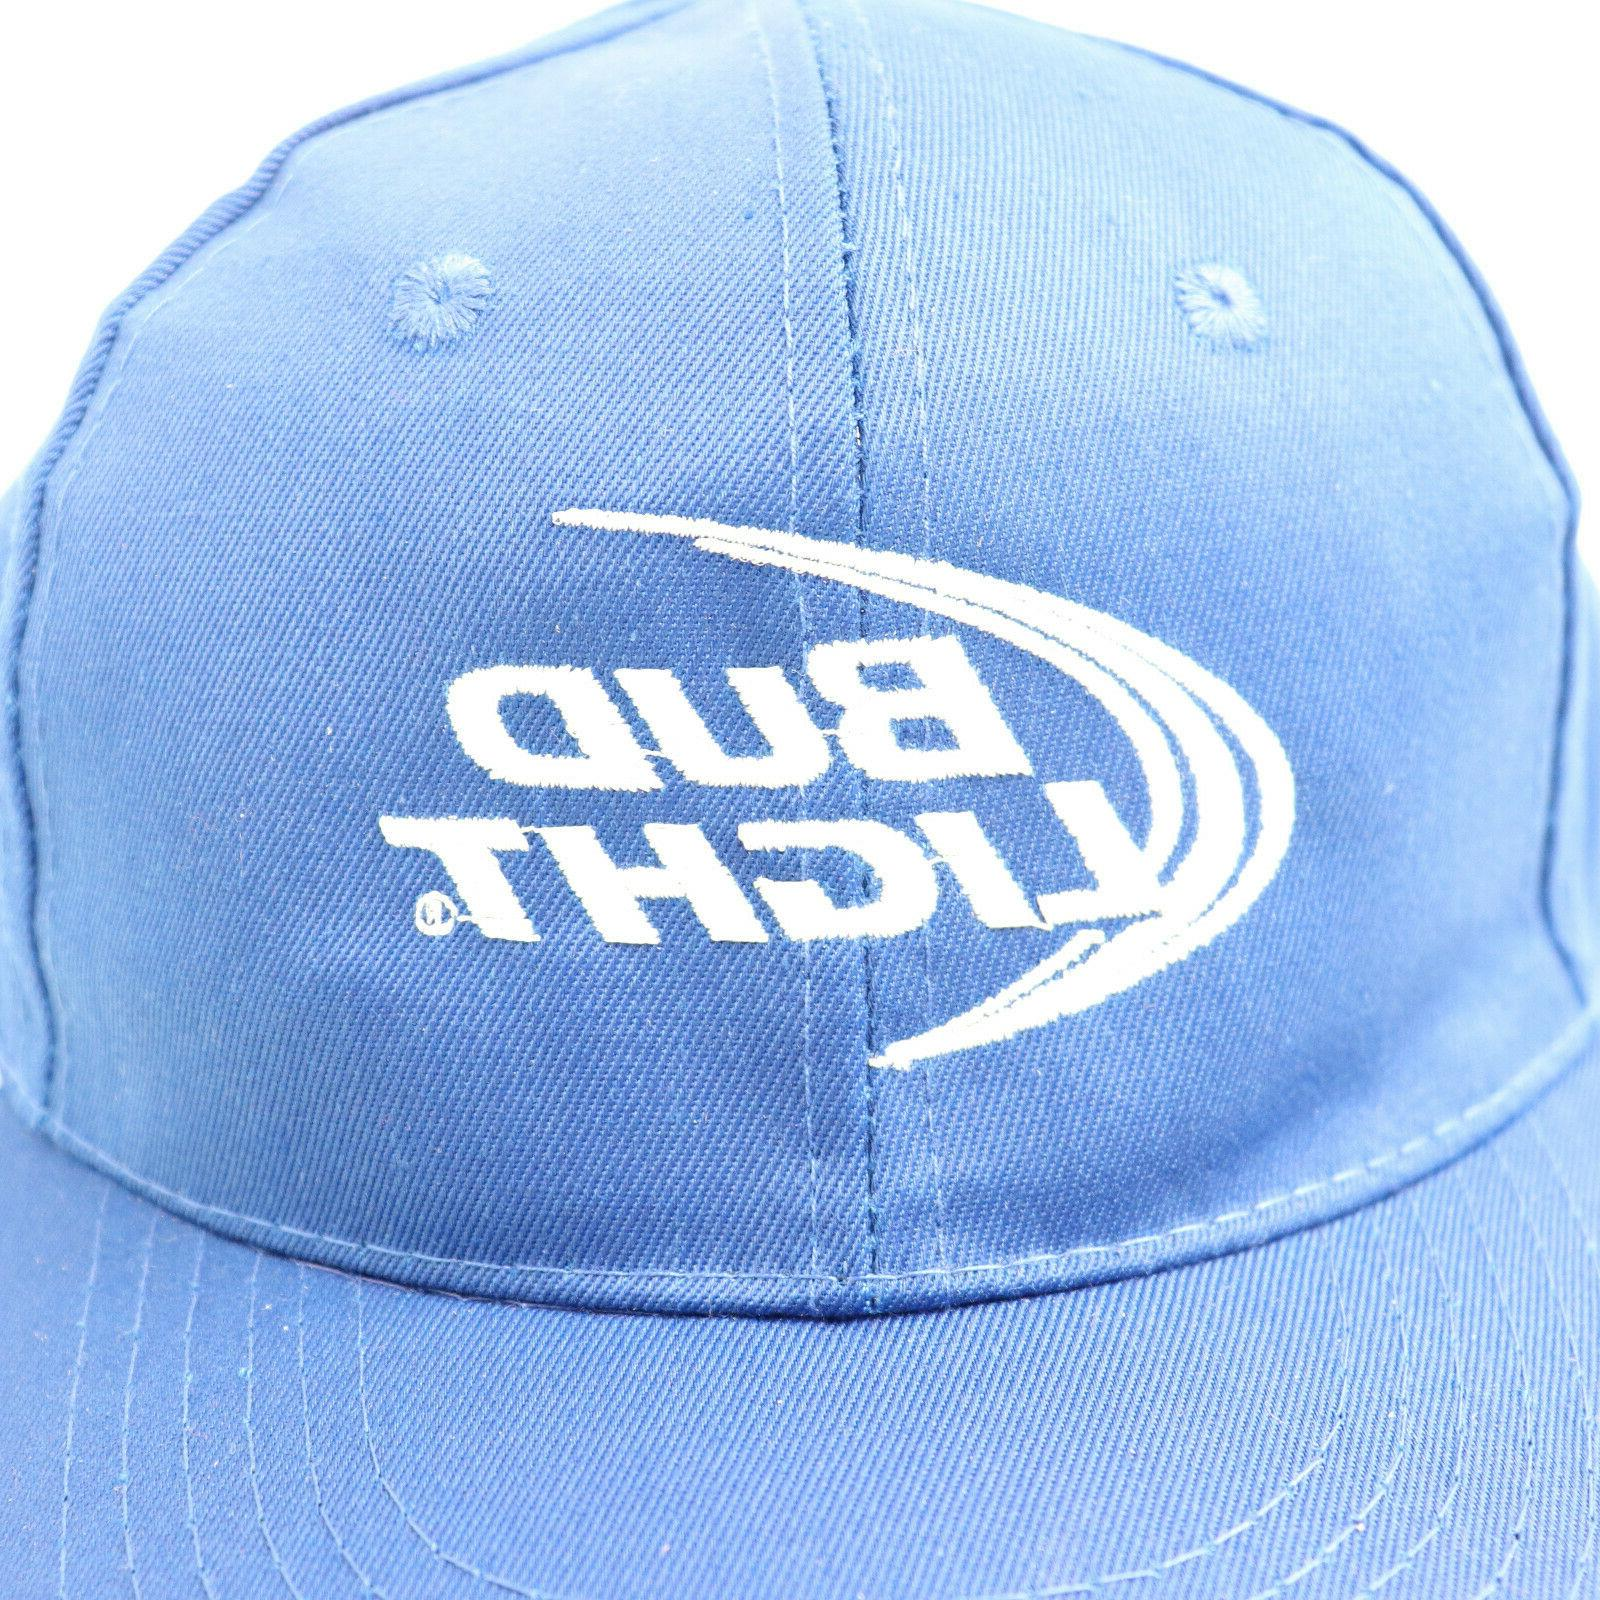 Bud Baseball Hat Strap